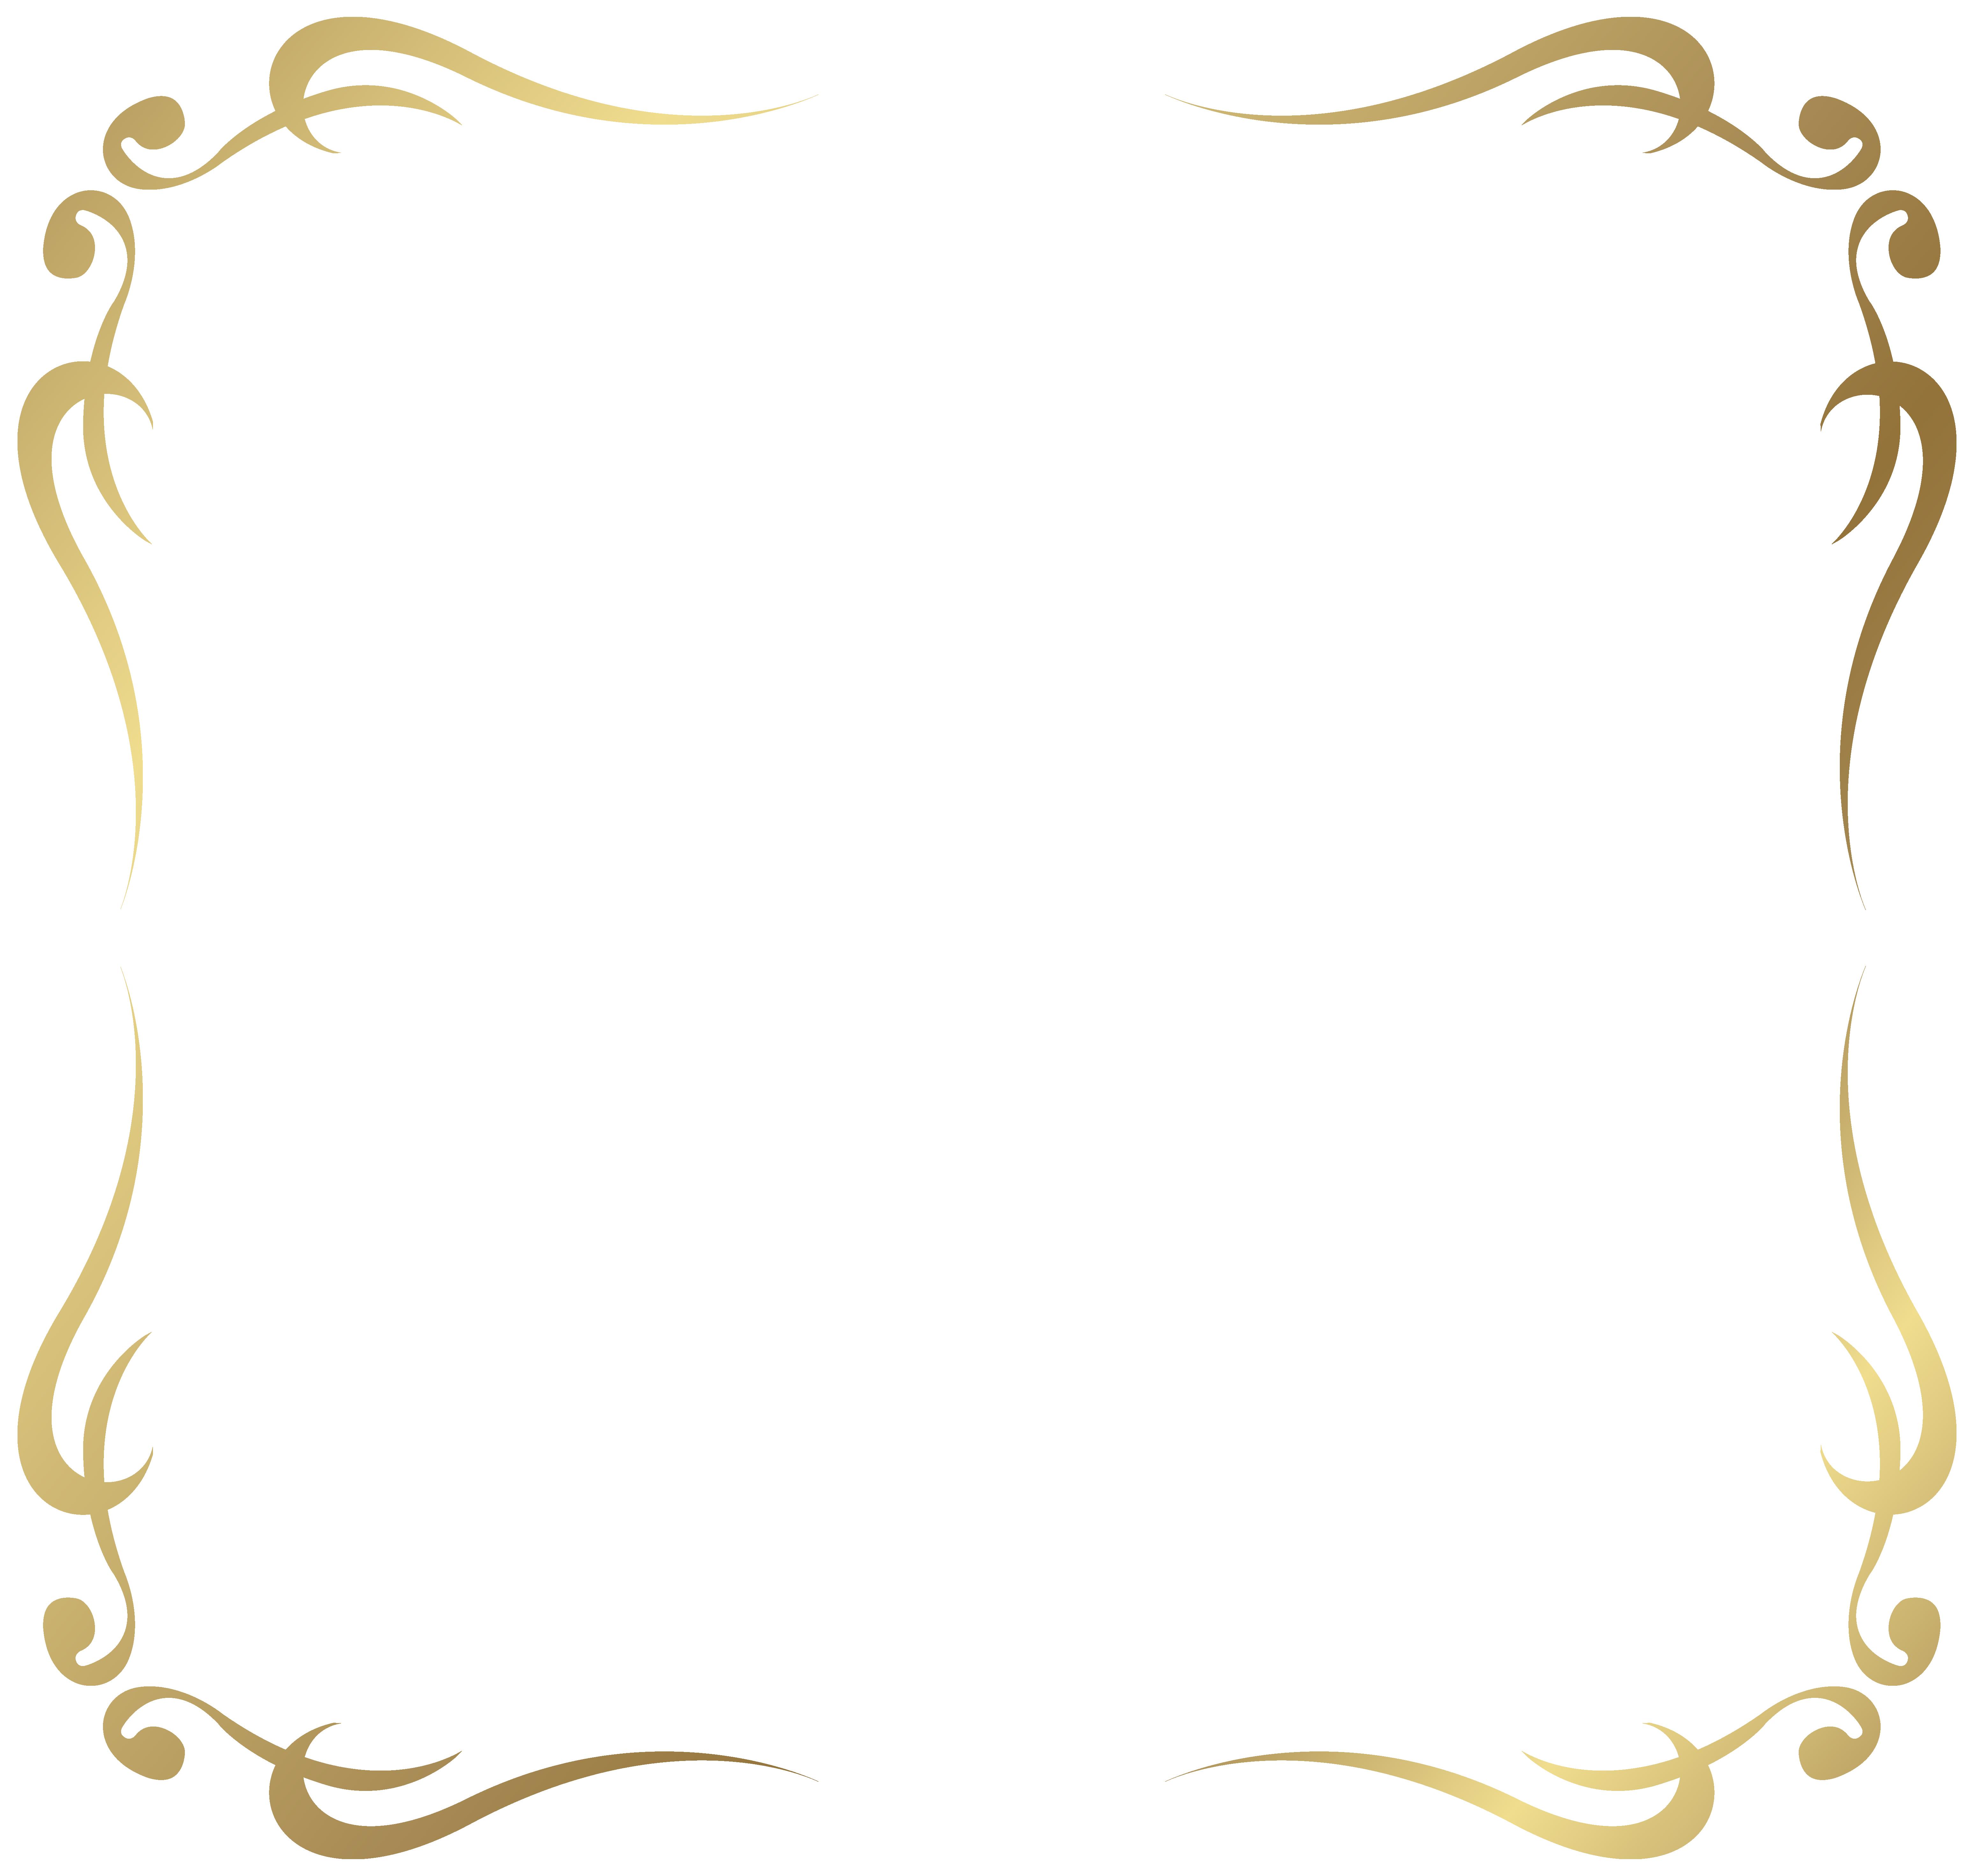 Decorative Picture Frame Border Gold Free Download Png Hd Picture Borders Frame Border Design Picture Frame Decor